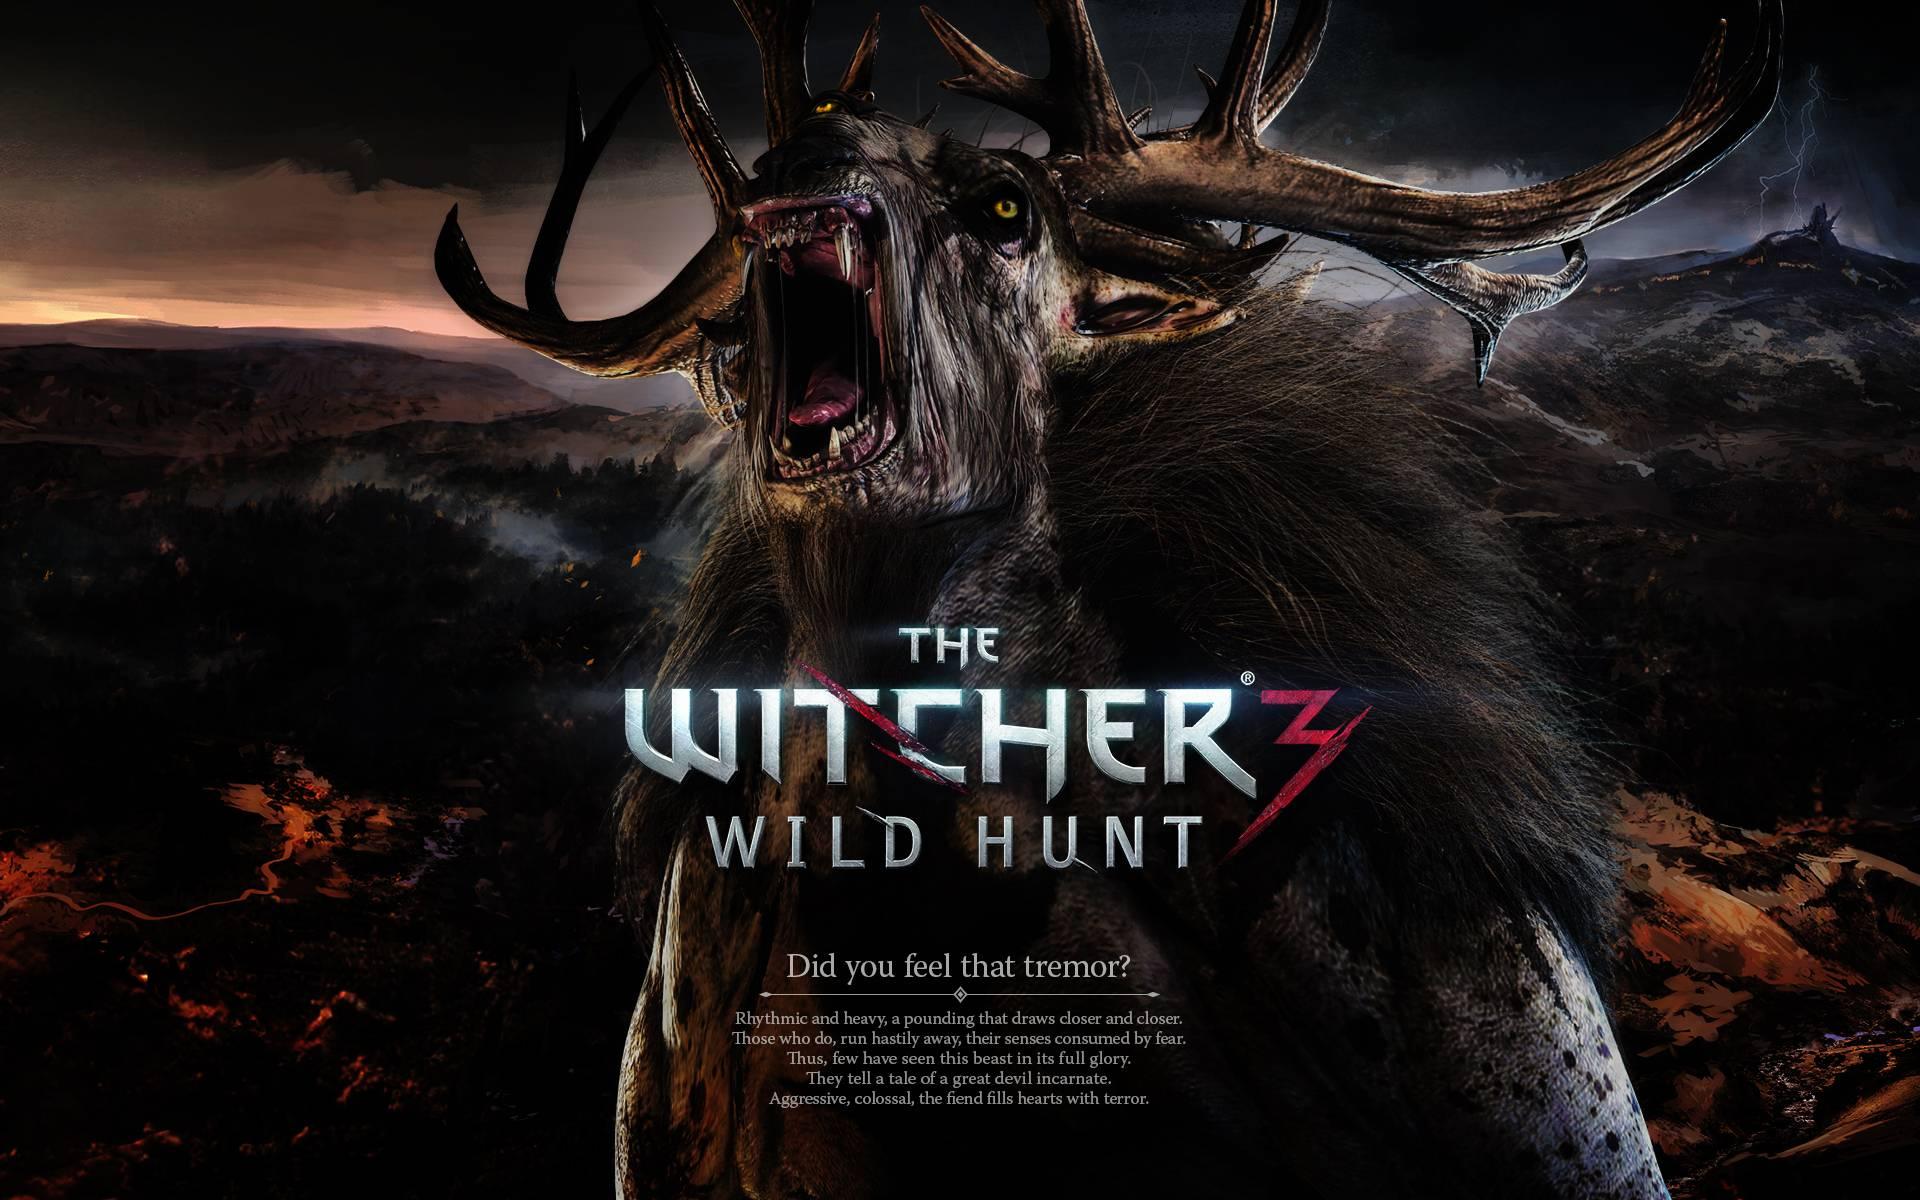 The Witcher 3 Image download in digitalimagemakerworldcom 1920x1200